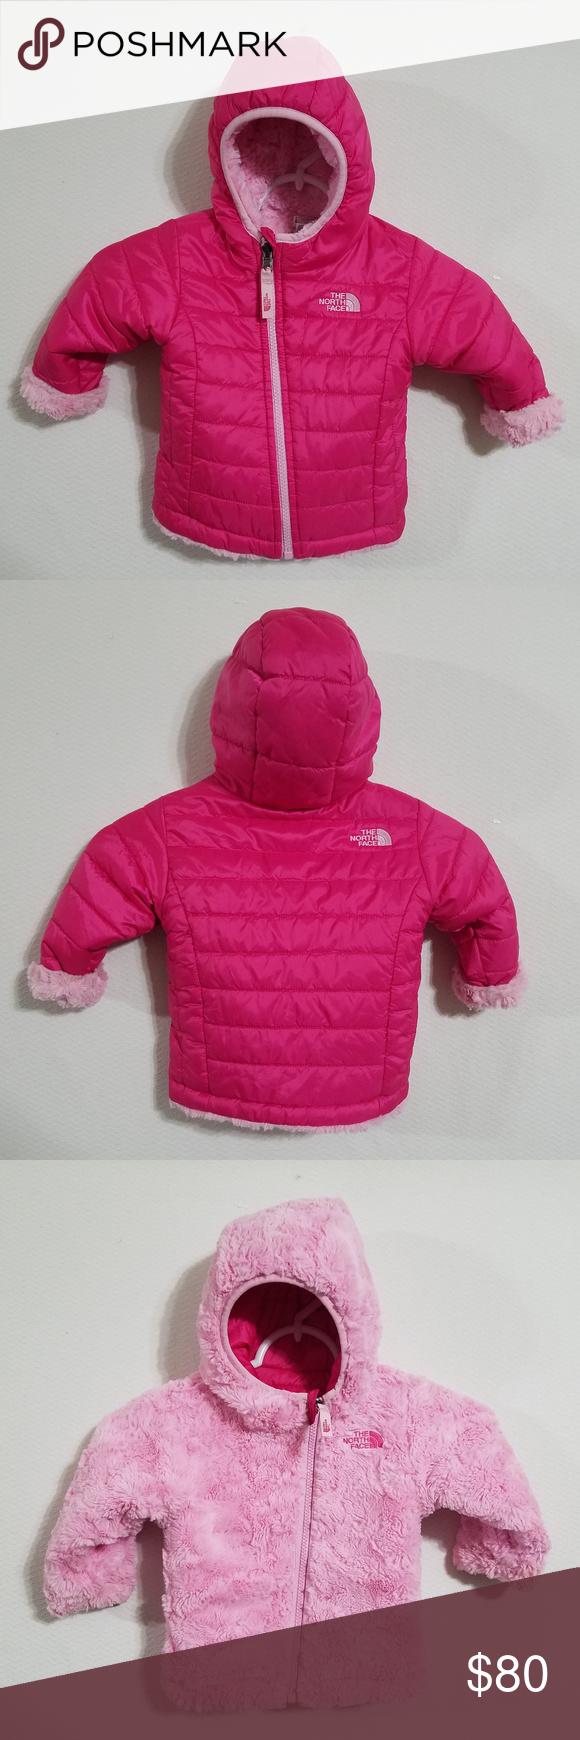 North Face Girls 612M Infant Winter Coat Jacket North